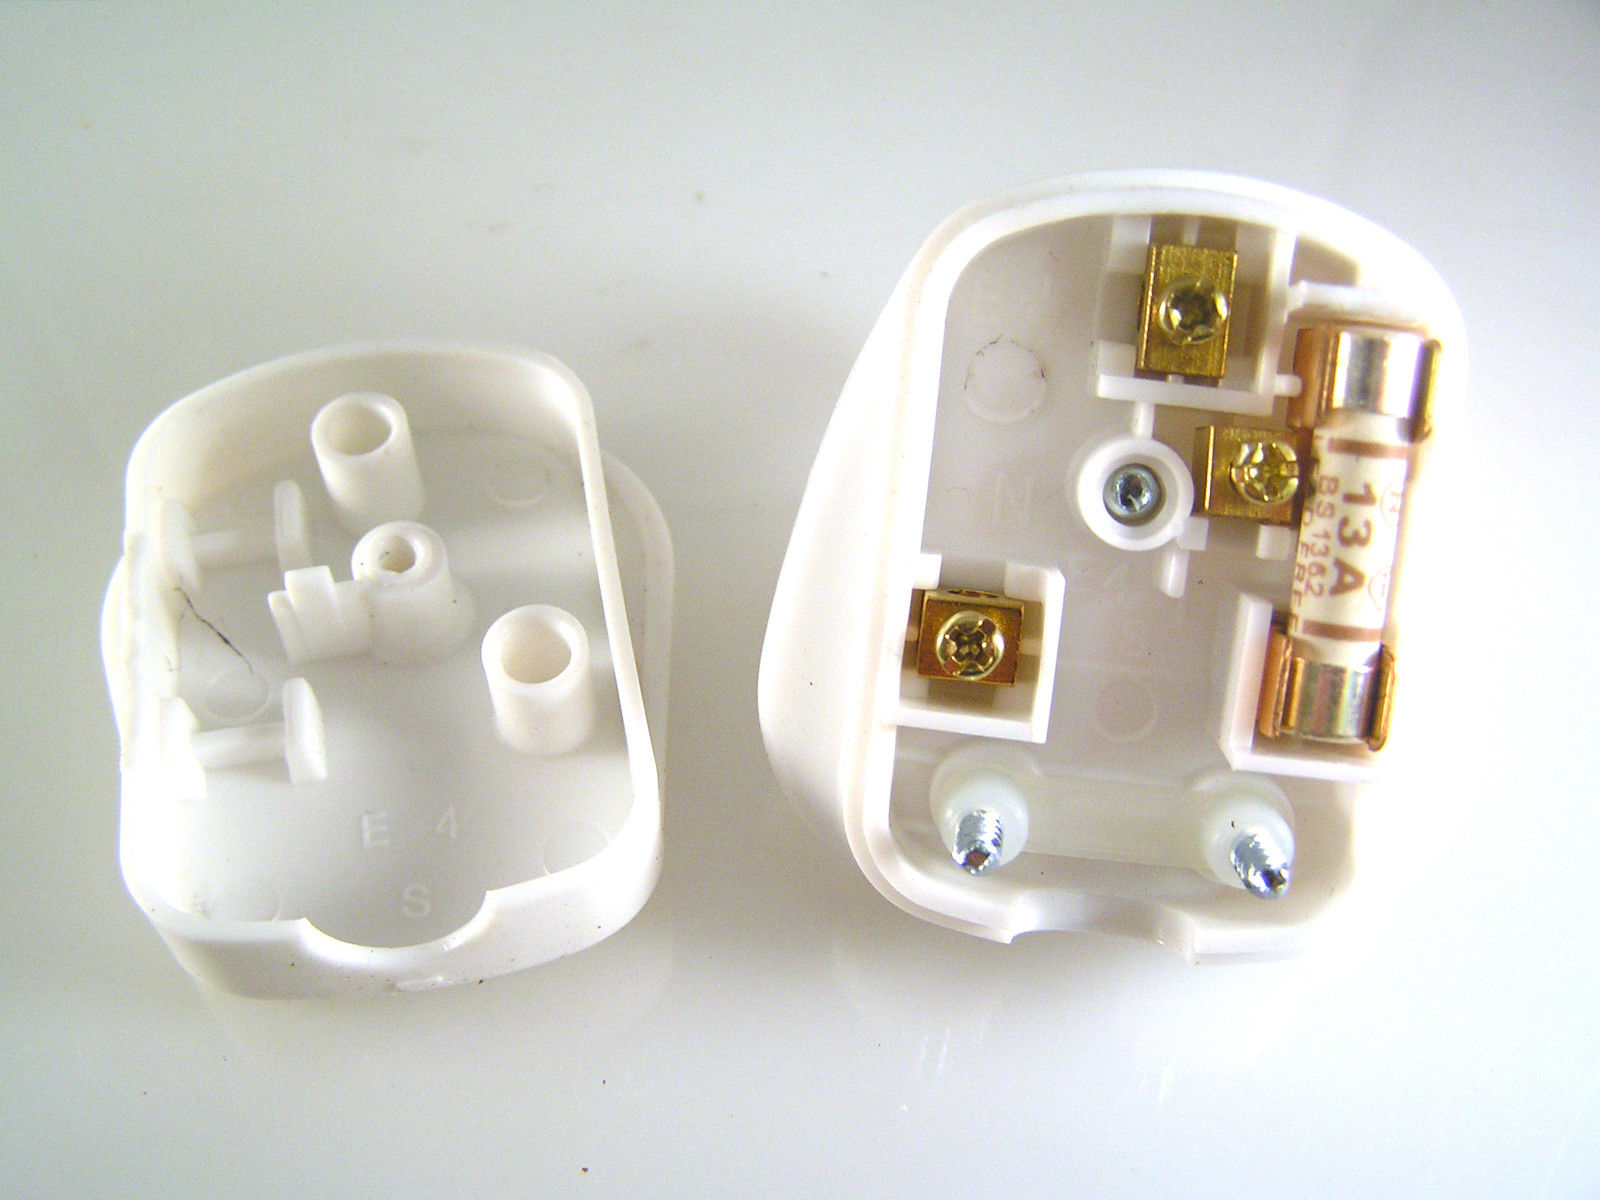 Pms Uk White 3 Pin Plug 250v 13a Fuse Kite Mark  Bs 1363  A Om1048